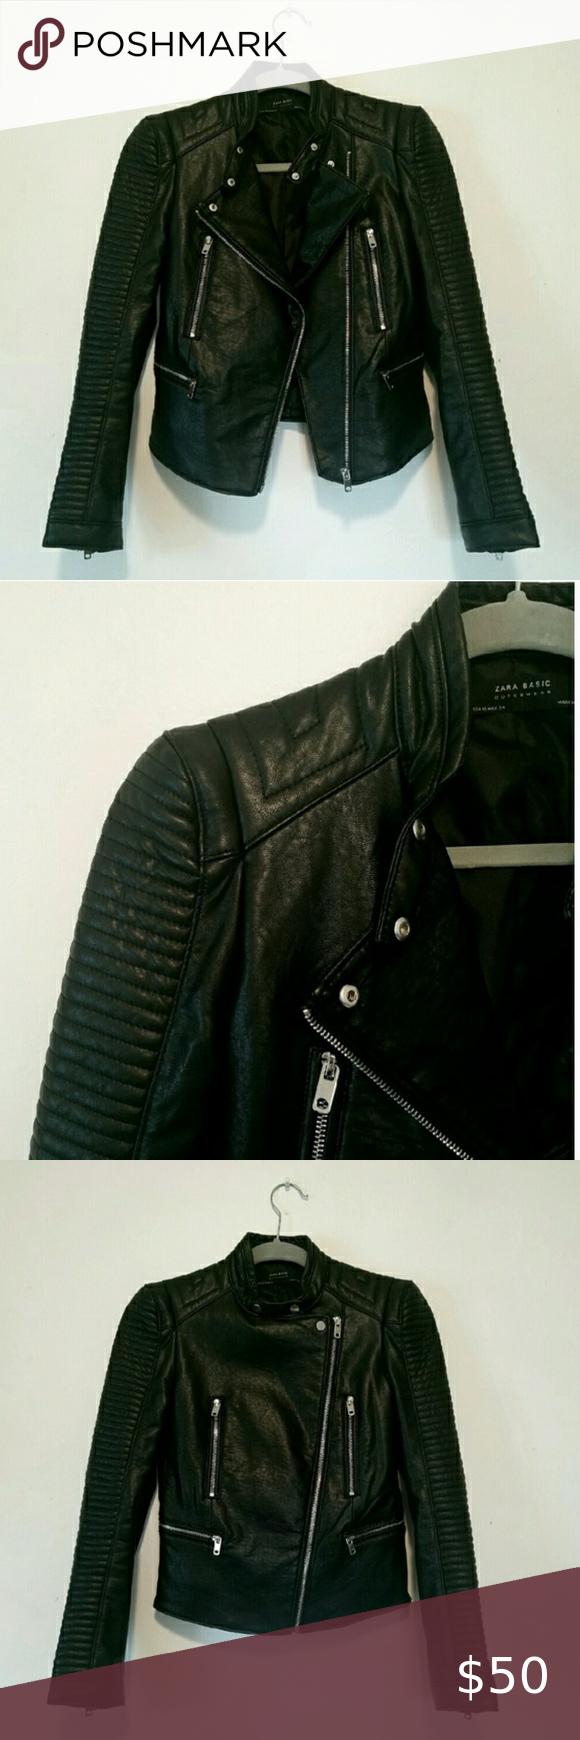 Zara Faux Leather Jacket Zara Leather Jacket Leather Jacket Flattering Jackets [ 1740 x 580 Pixel ]